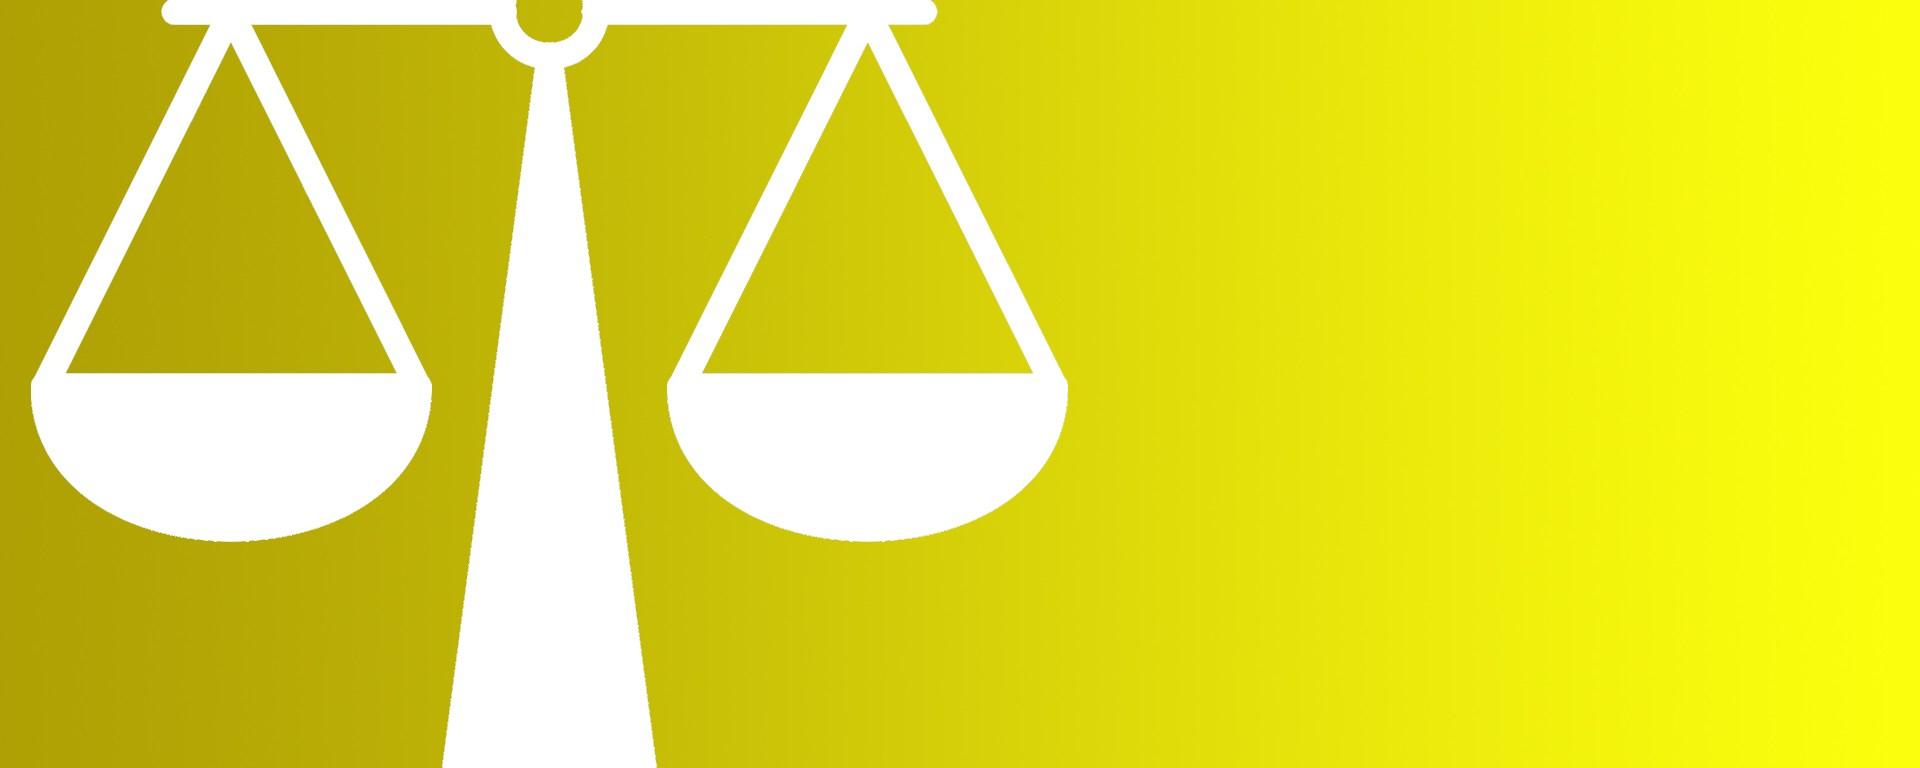 importance of criminal justice professionals